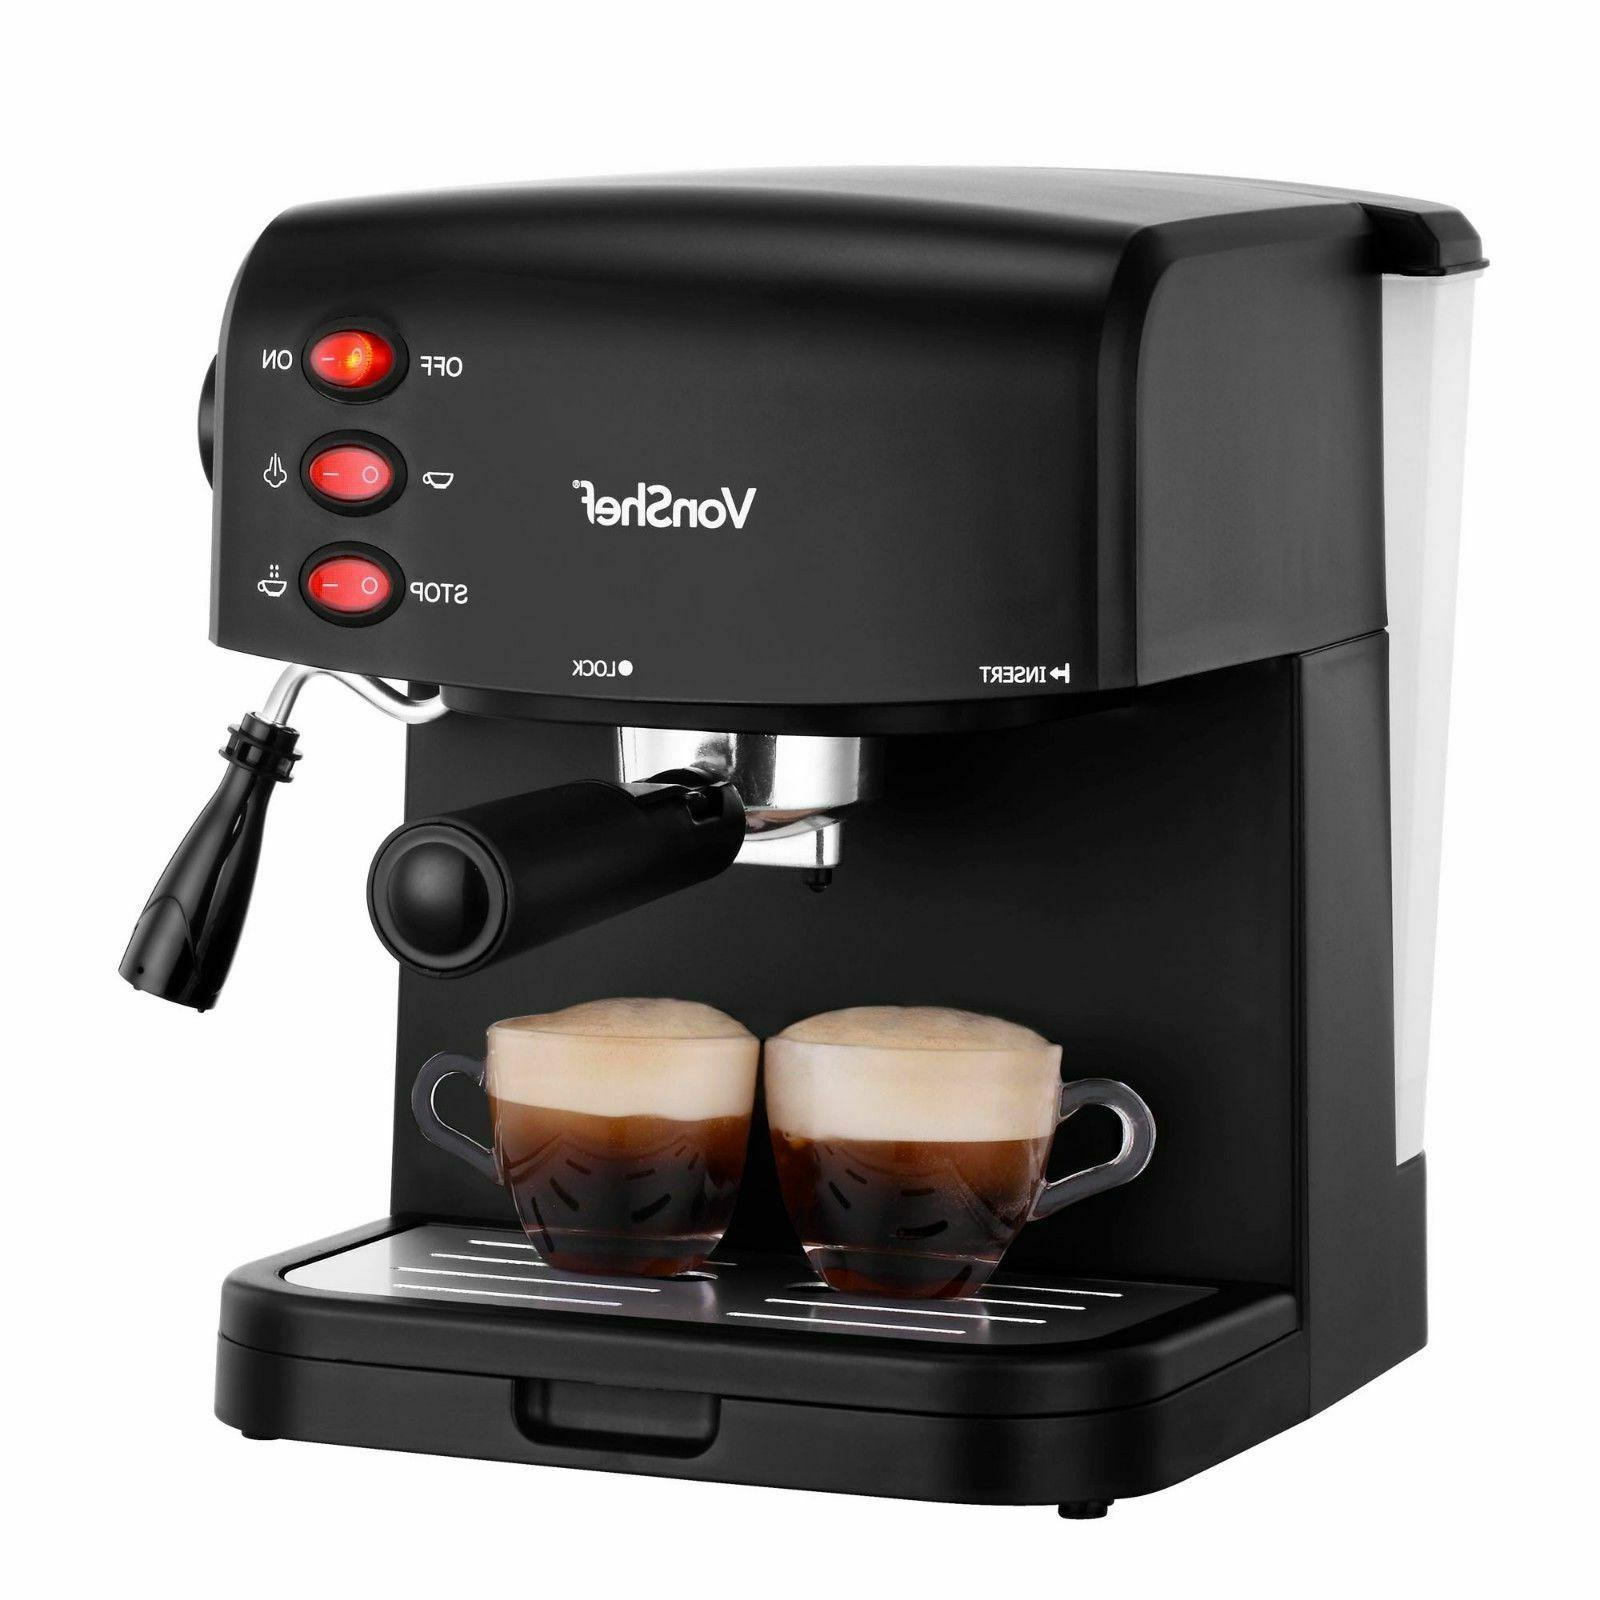 new espresso coffee machine maker 15 bar